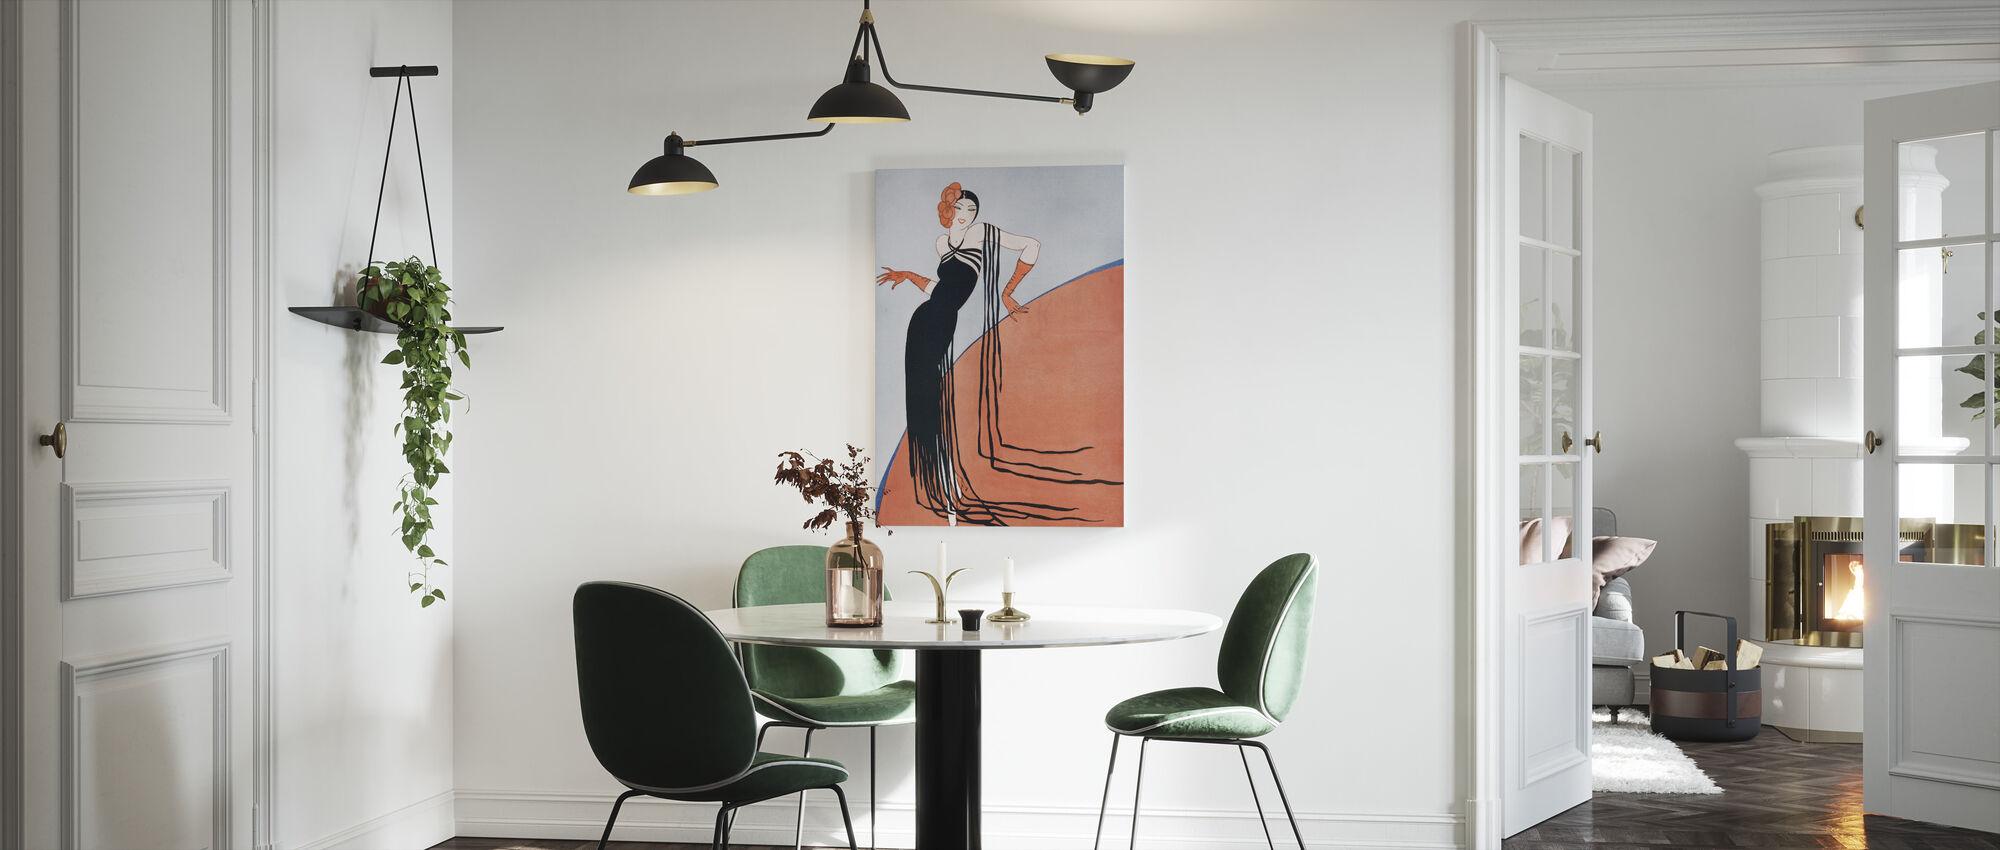 Spaanse dame, Gordon Conway - Canvas print - Keuken